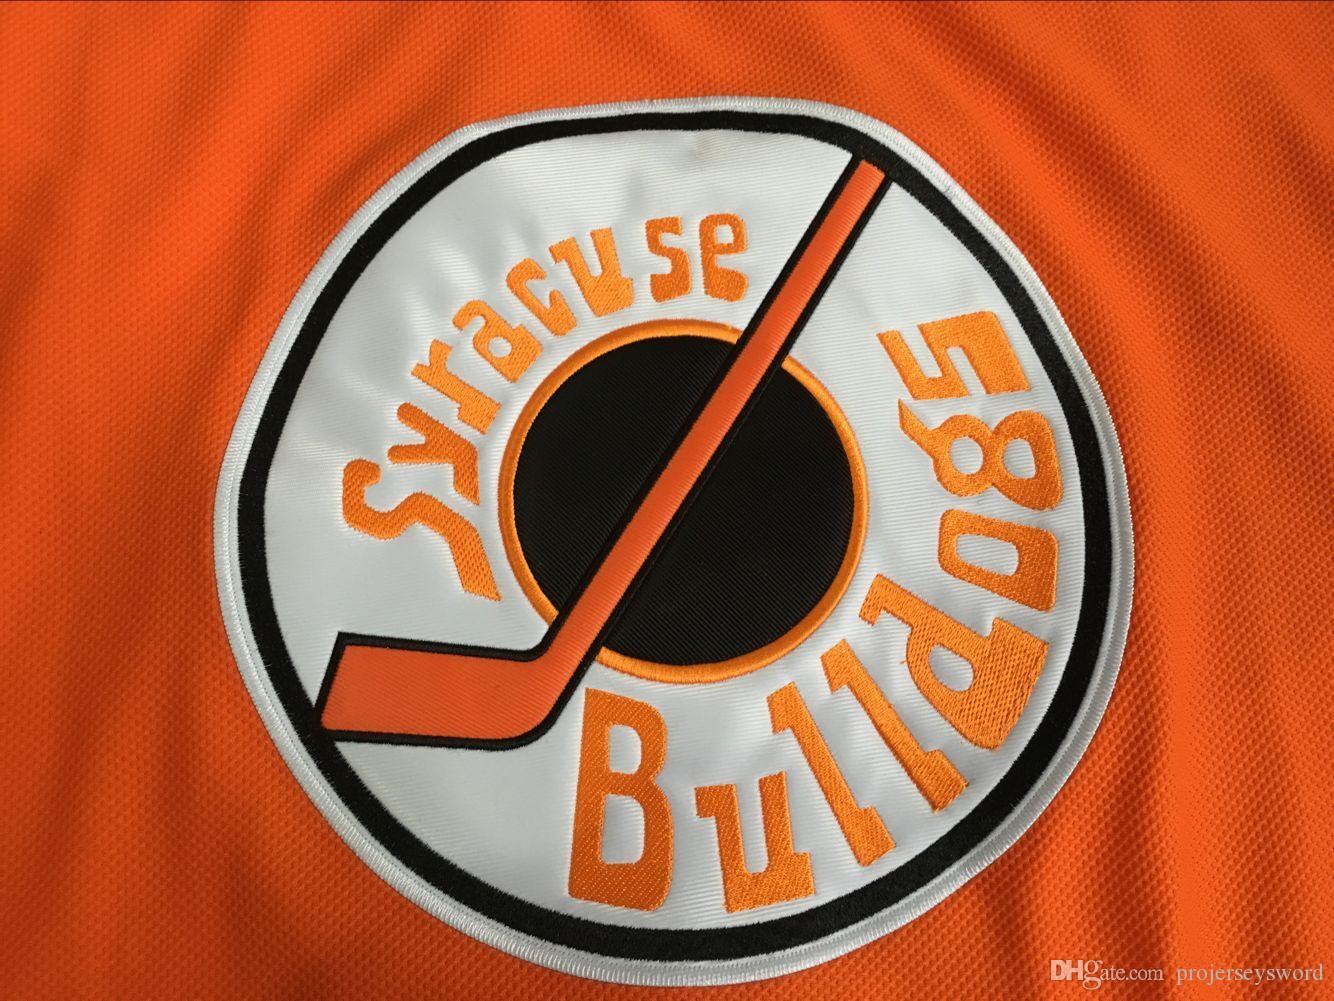 Slap Shot Movie Jerseys Ogie Ogilthorpe Mens 100% Stitched Ice Hockey Jerseys #2 Ogie Ogilthorpe Syracuse Bulldoges Jersey